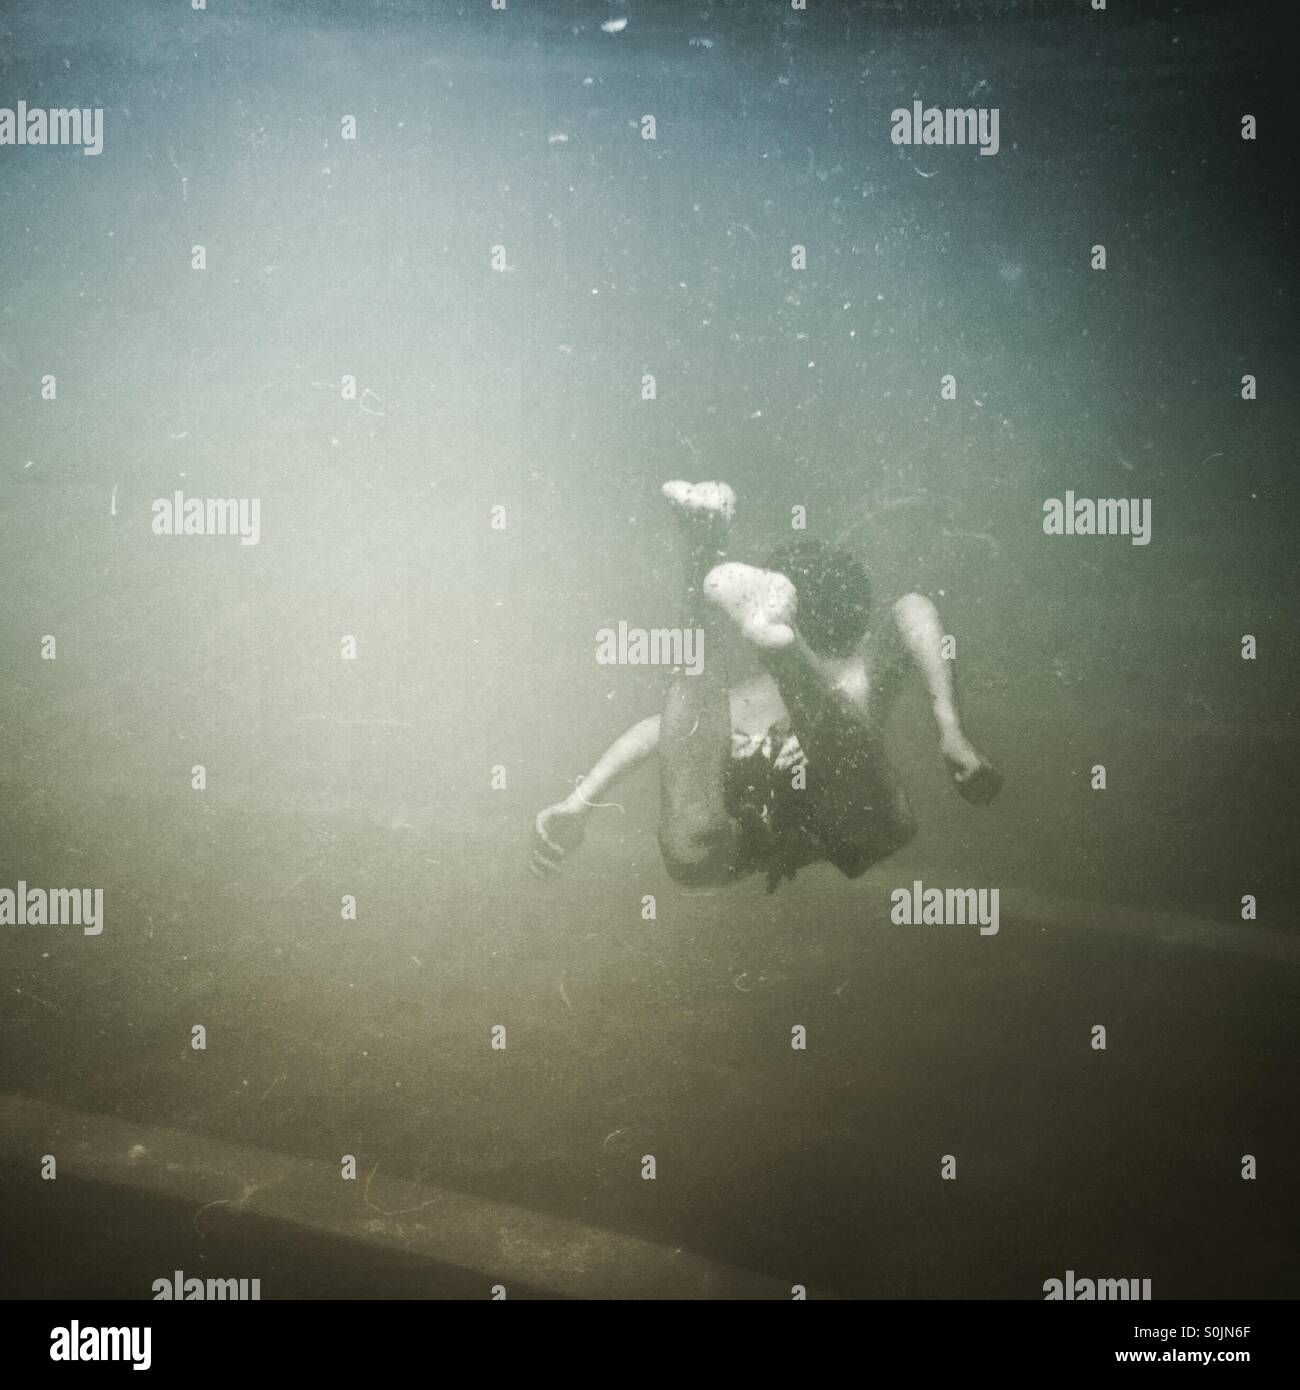 Garçon de nager dans une piscine Photo Stock